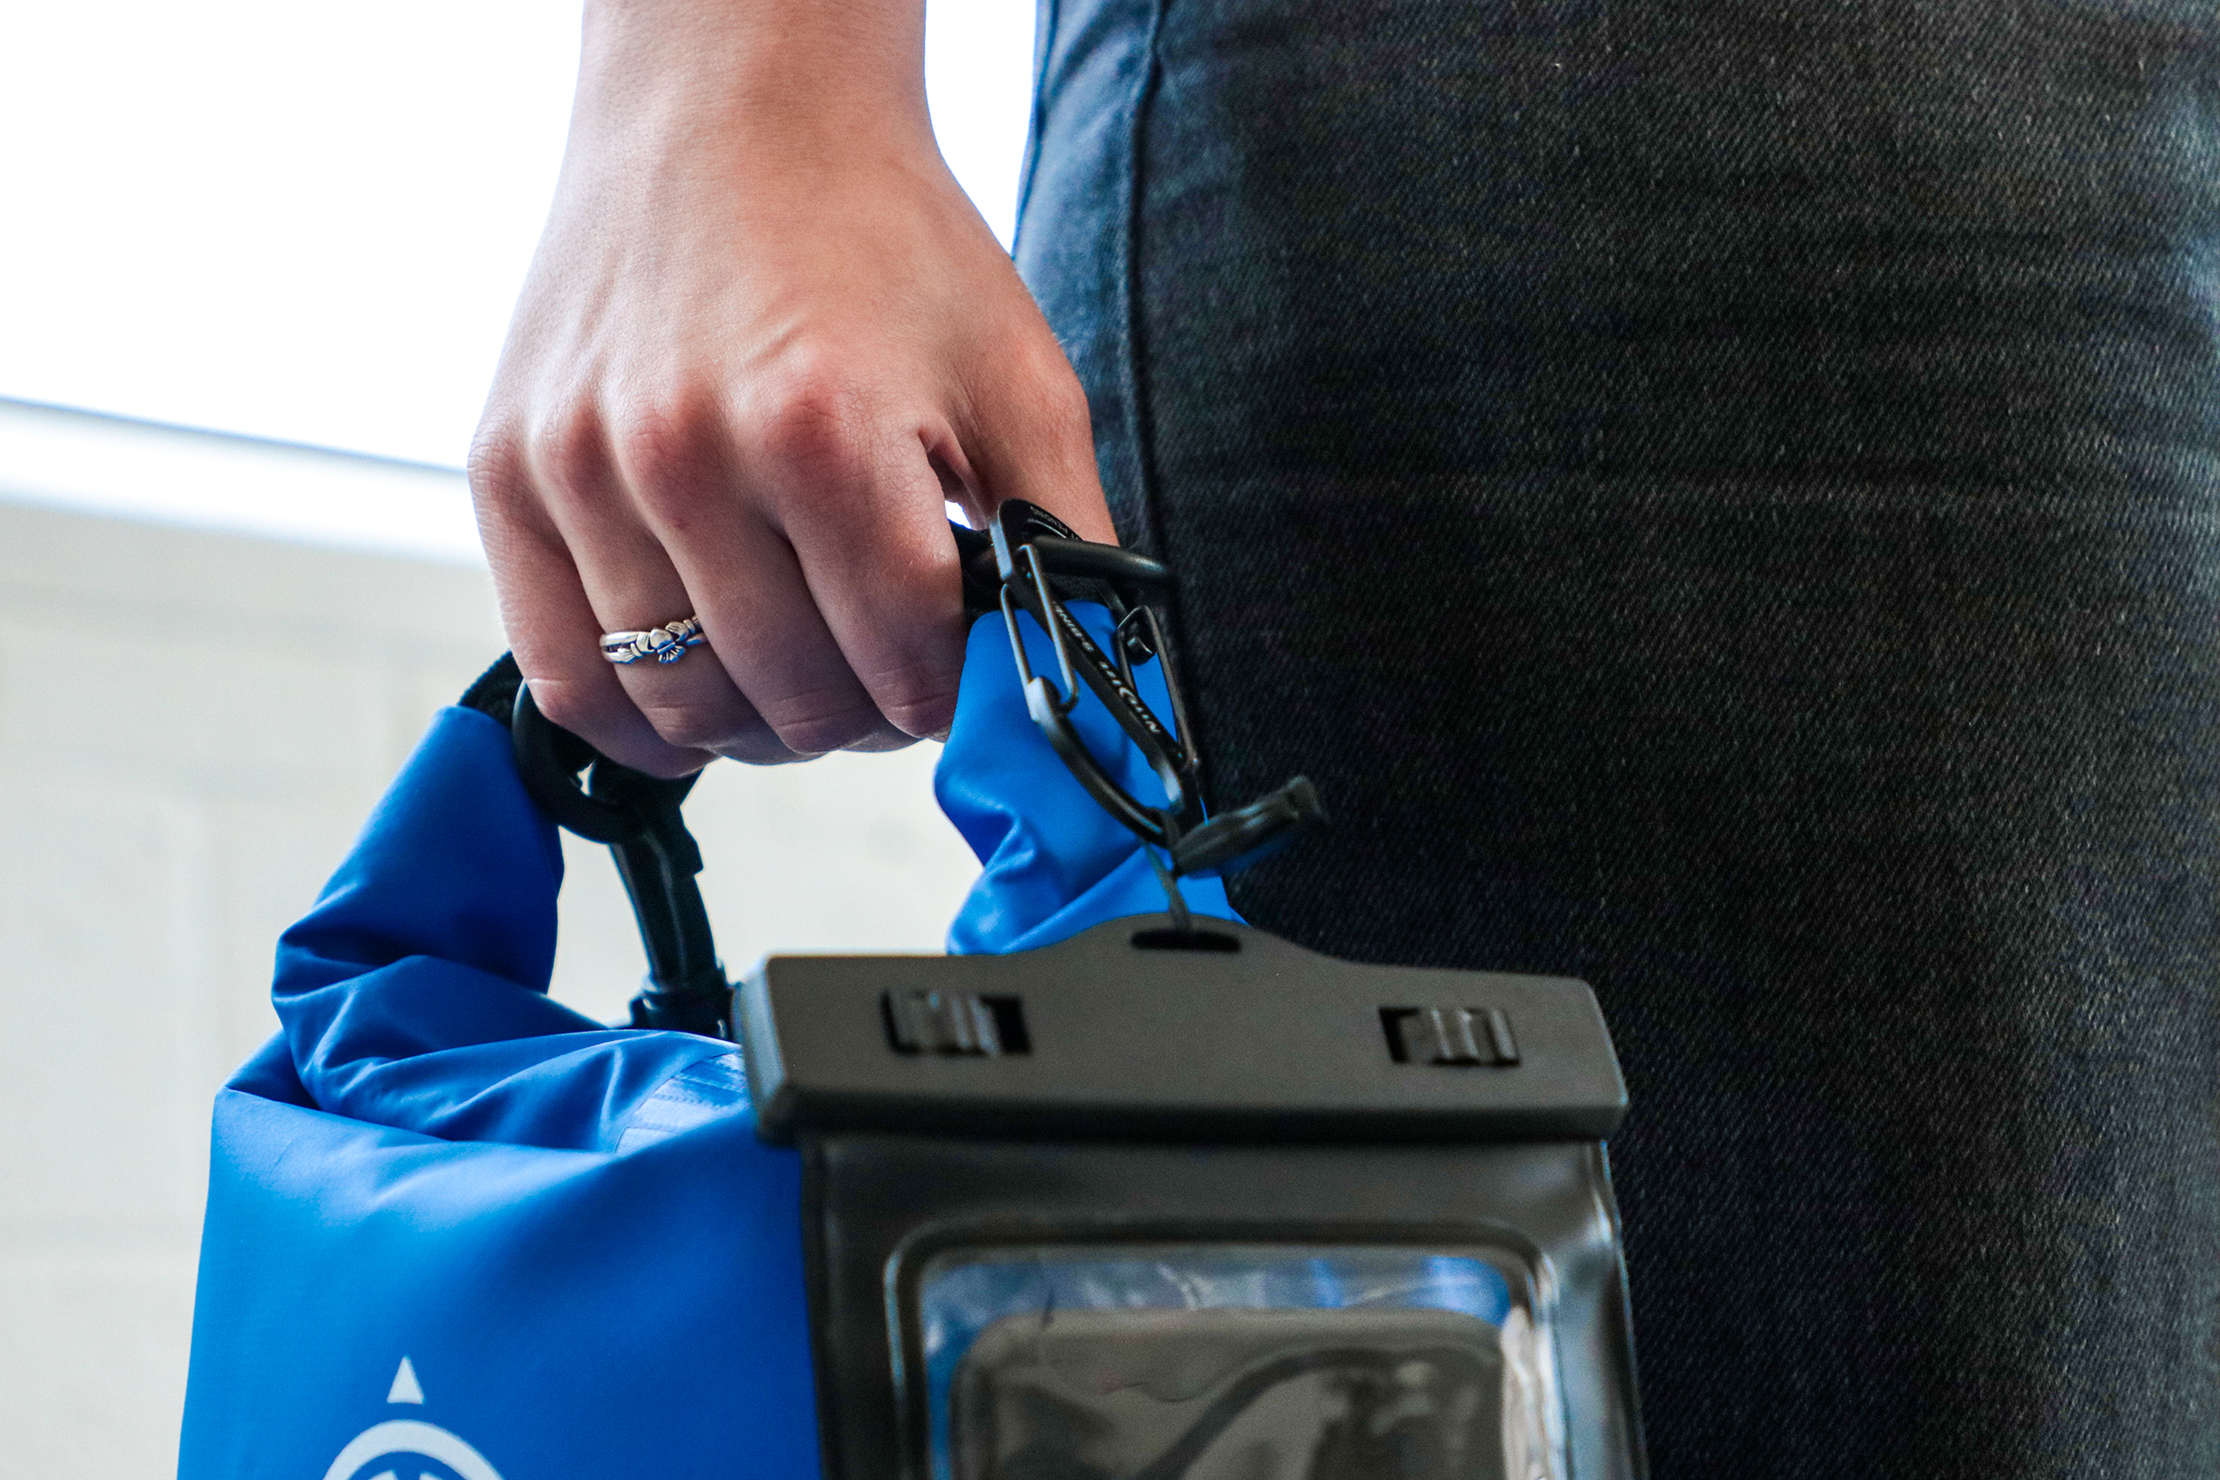 Earth Pak Original Waterproof Dry Bag With Phone In hand